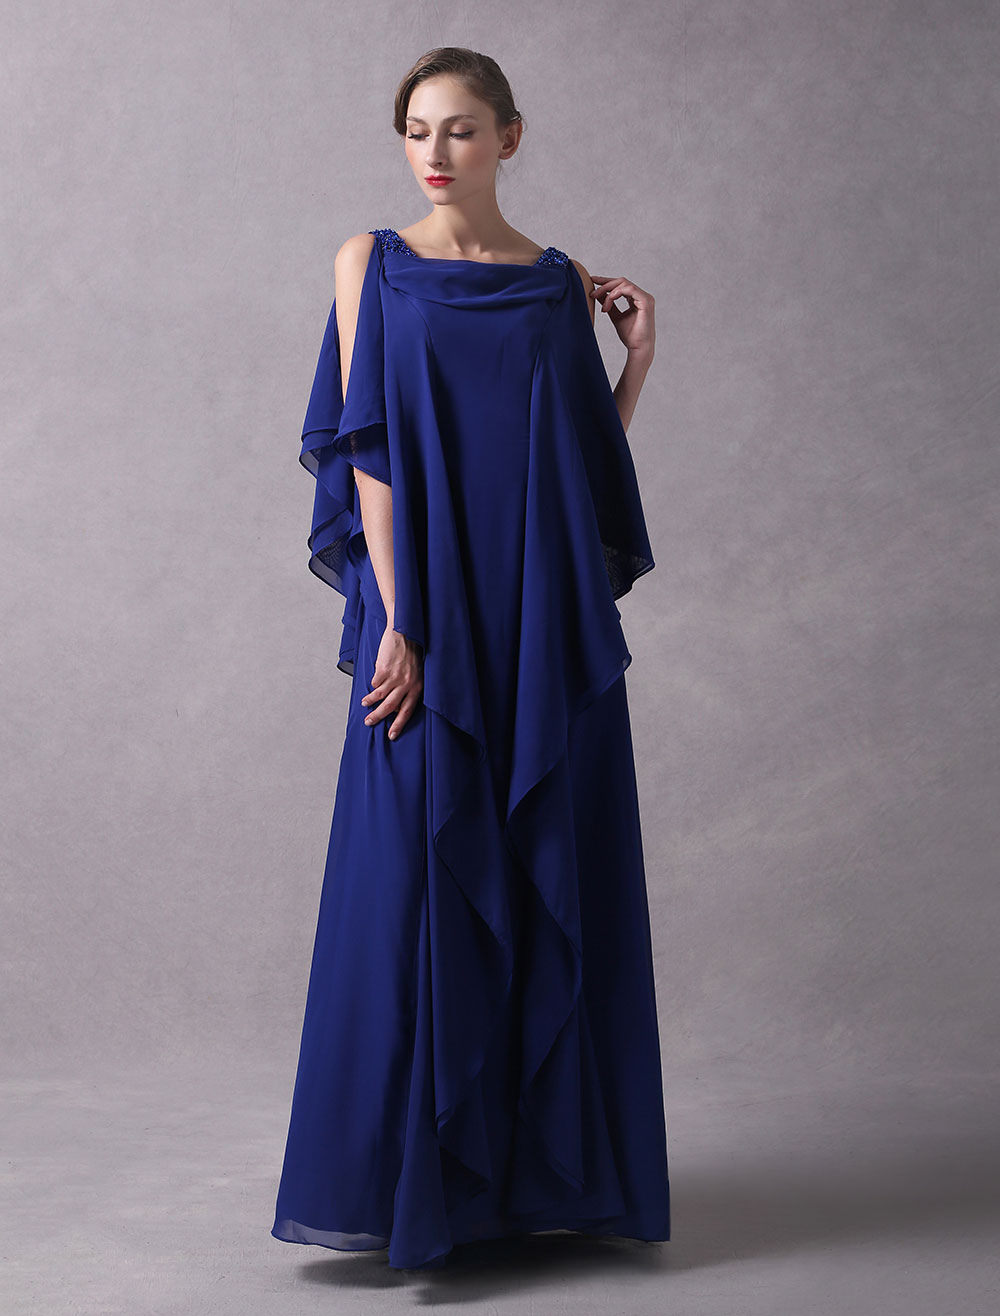 Evening Dresses Arabic Royal Blue Chiffon Cascading Ruffles Beaded